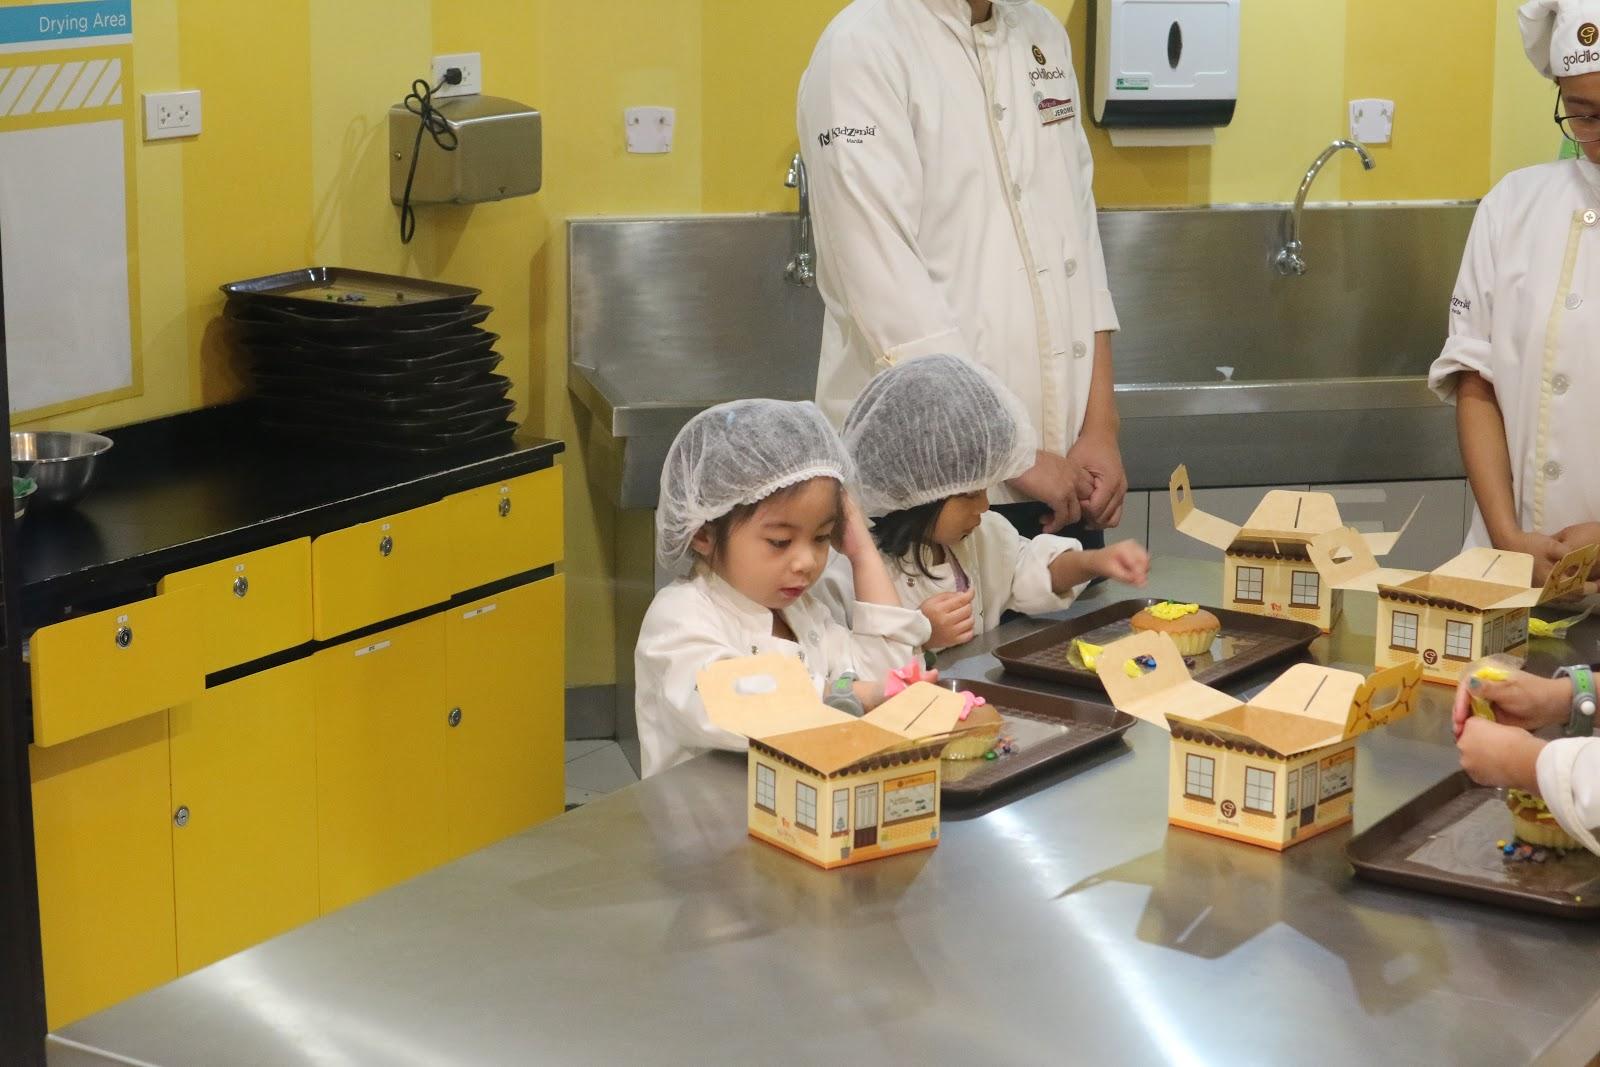 Chloe baking in KidZania Manila